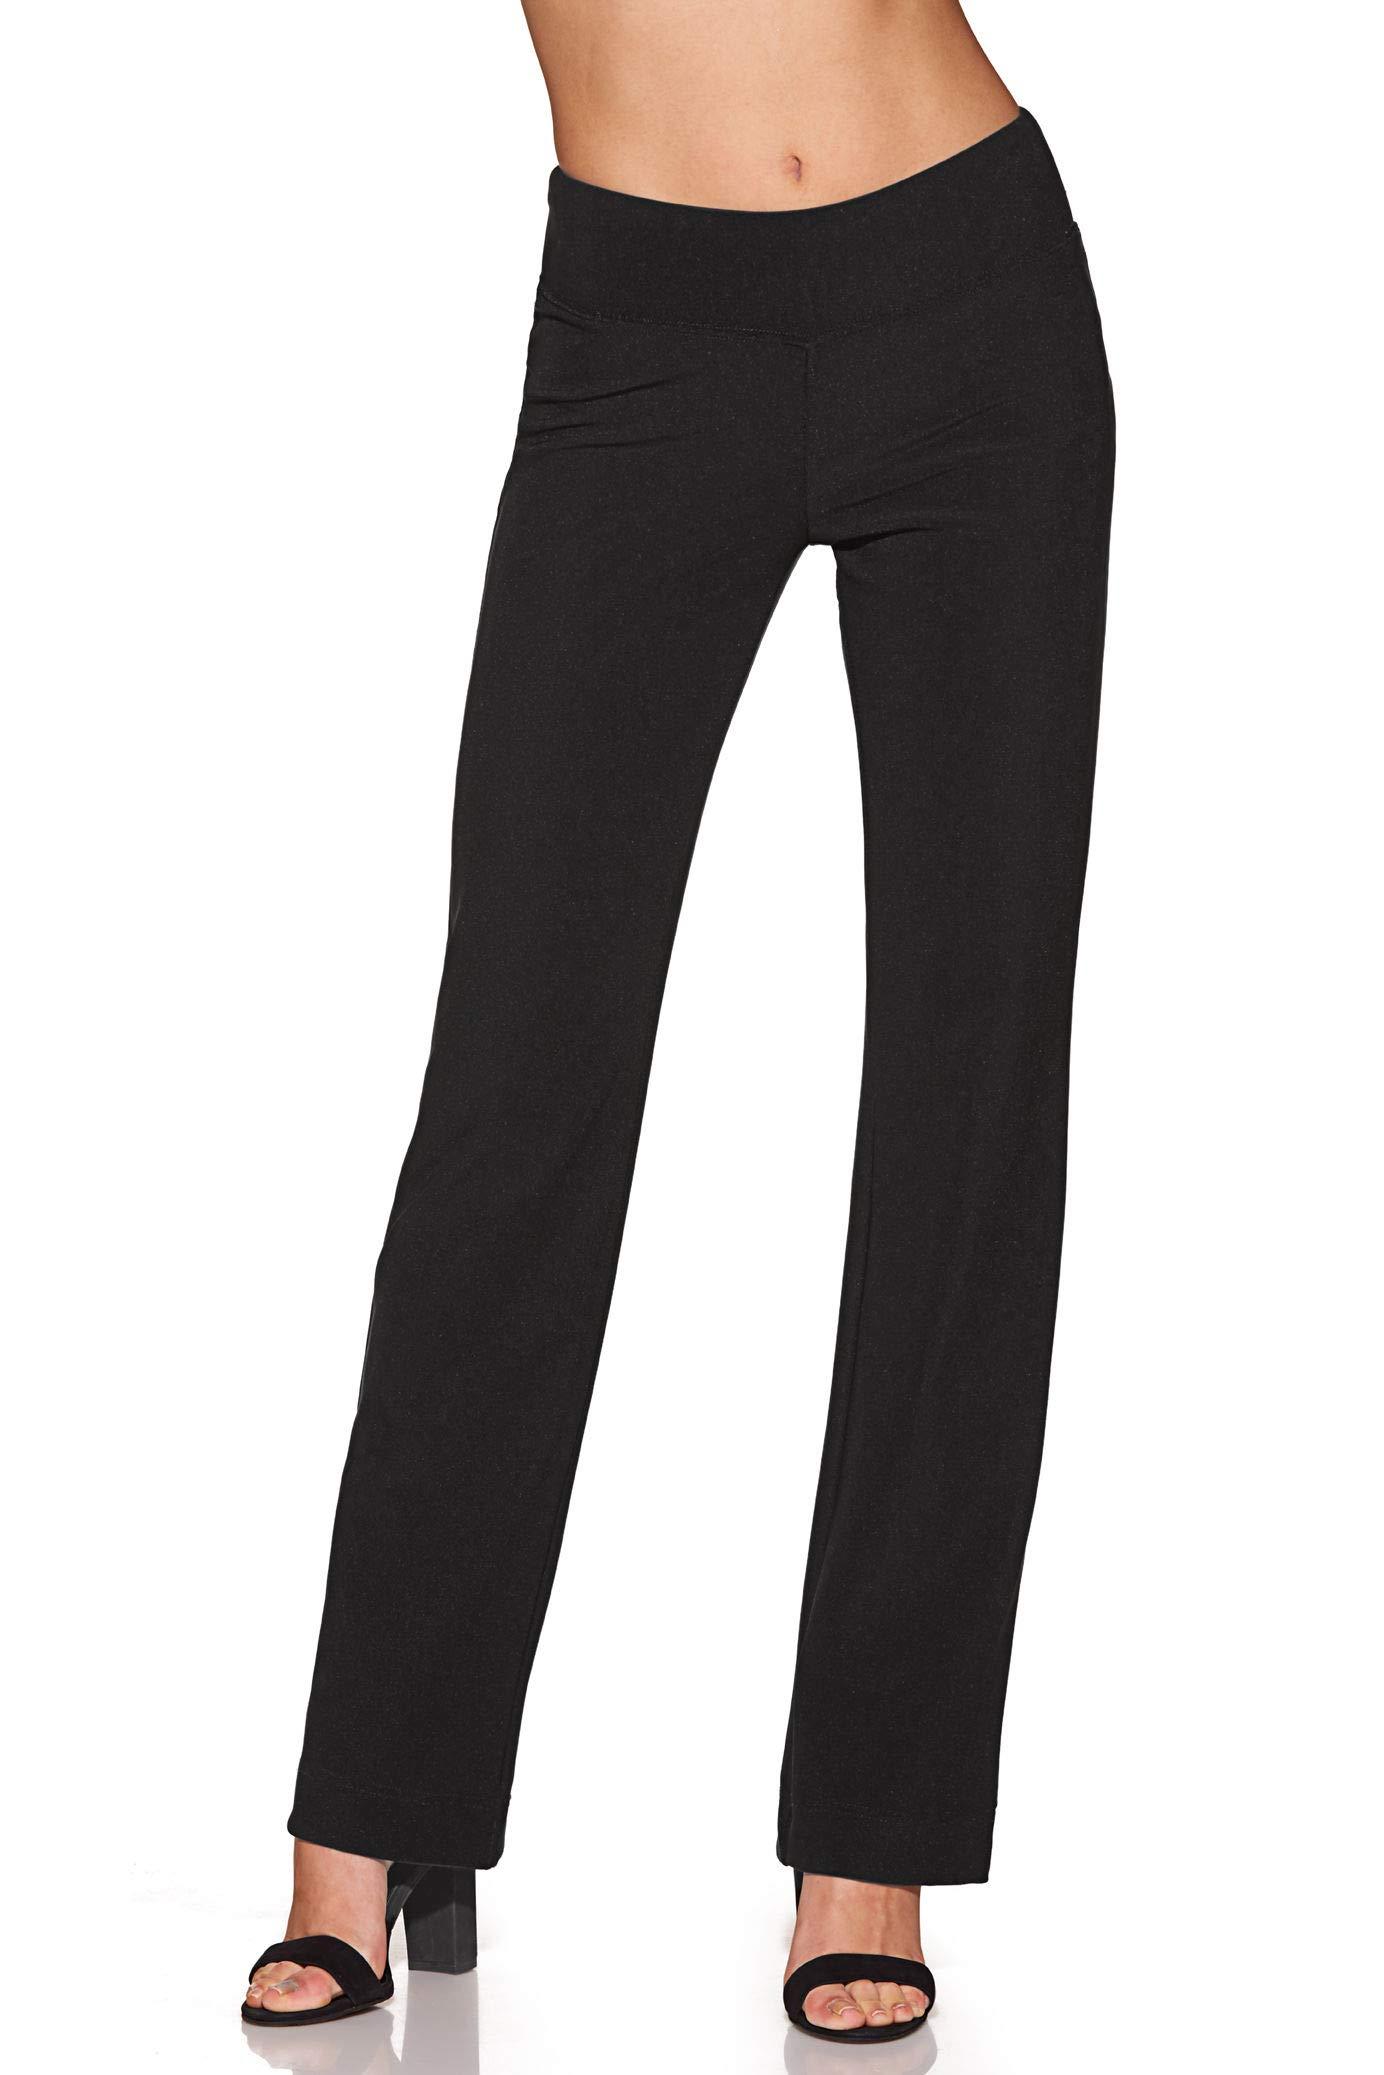 Beyond Travel Women's Wrinkle-Resistant Straight-Leg Knit Solid Color Pant Jet Black Medium Long